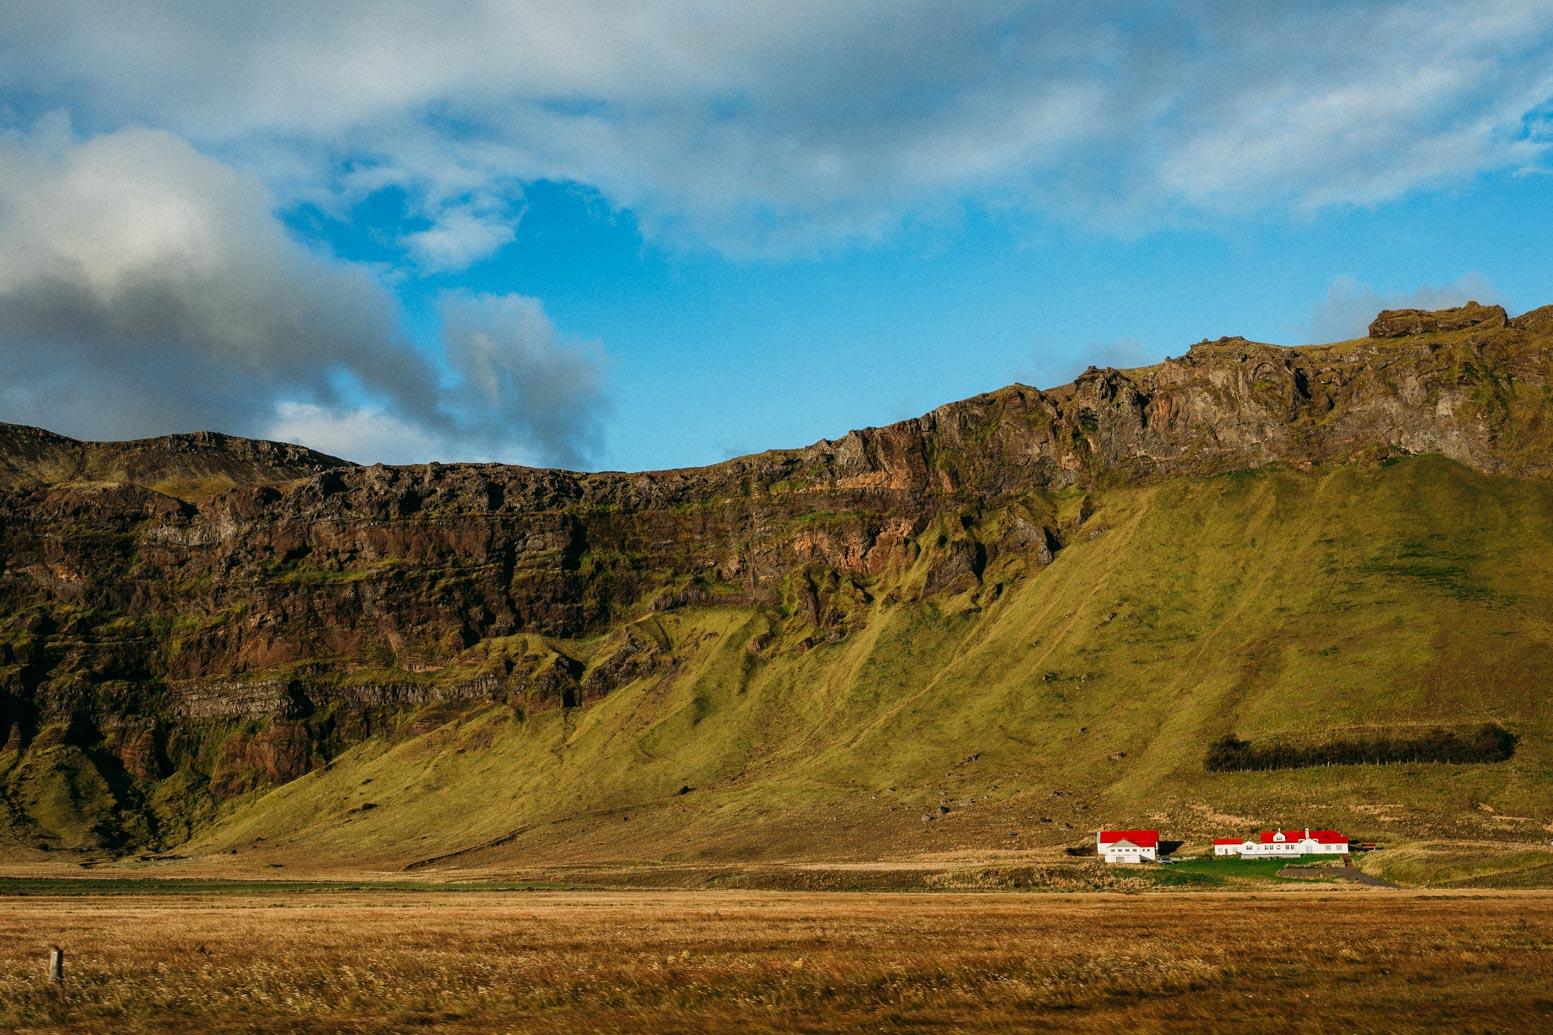 Drive back to Reykjavik from Solheimasandur Plane Wreck